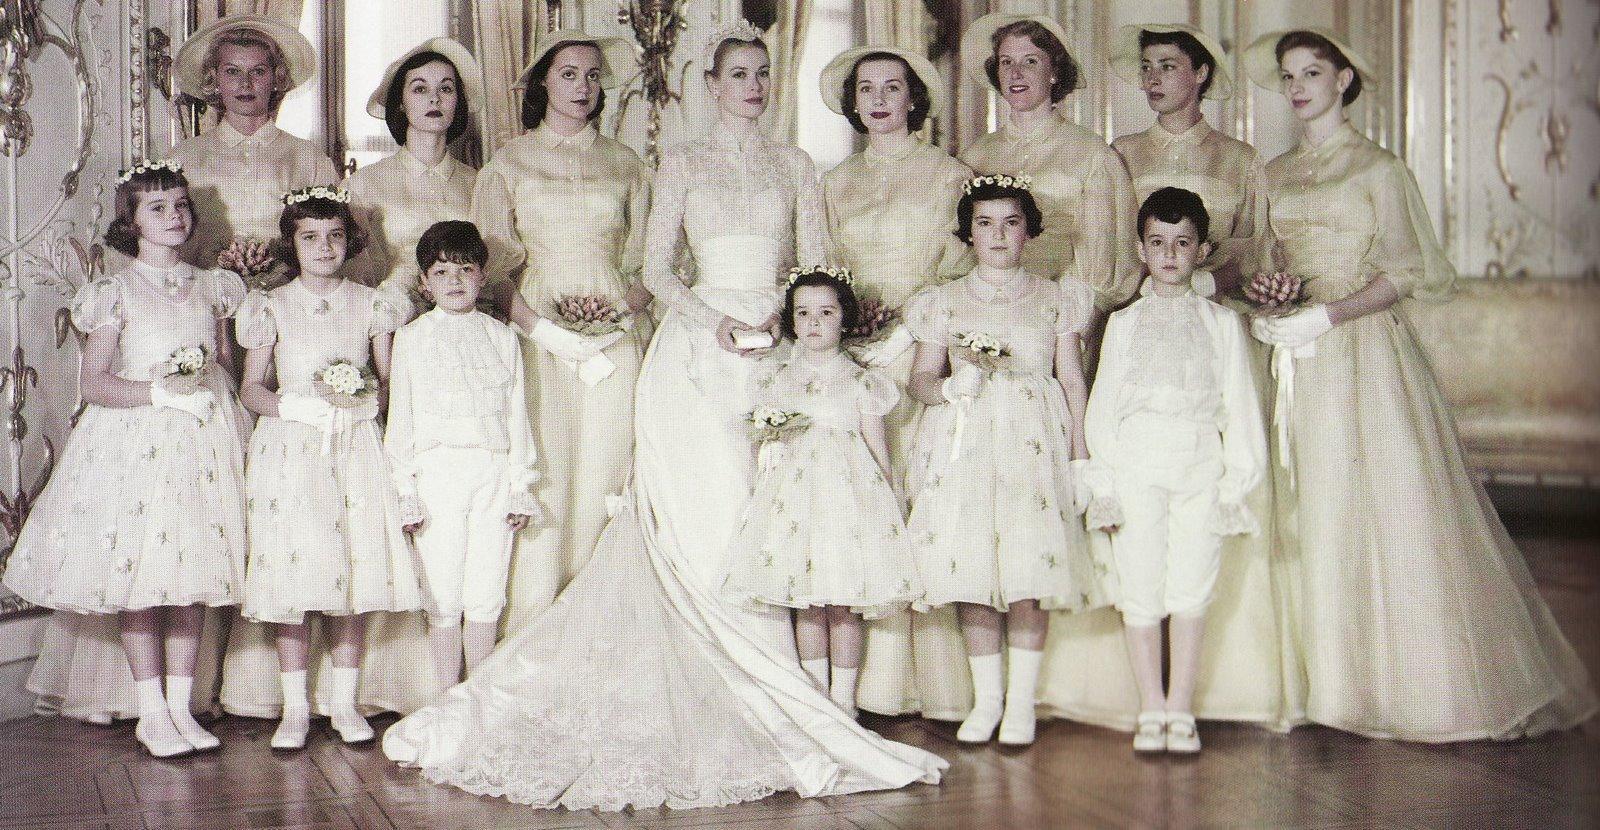 GRACE  1929 - 2009 - Página 5 Grace-kelly-bridal-party-790484